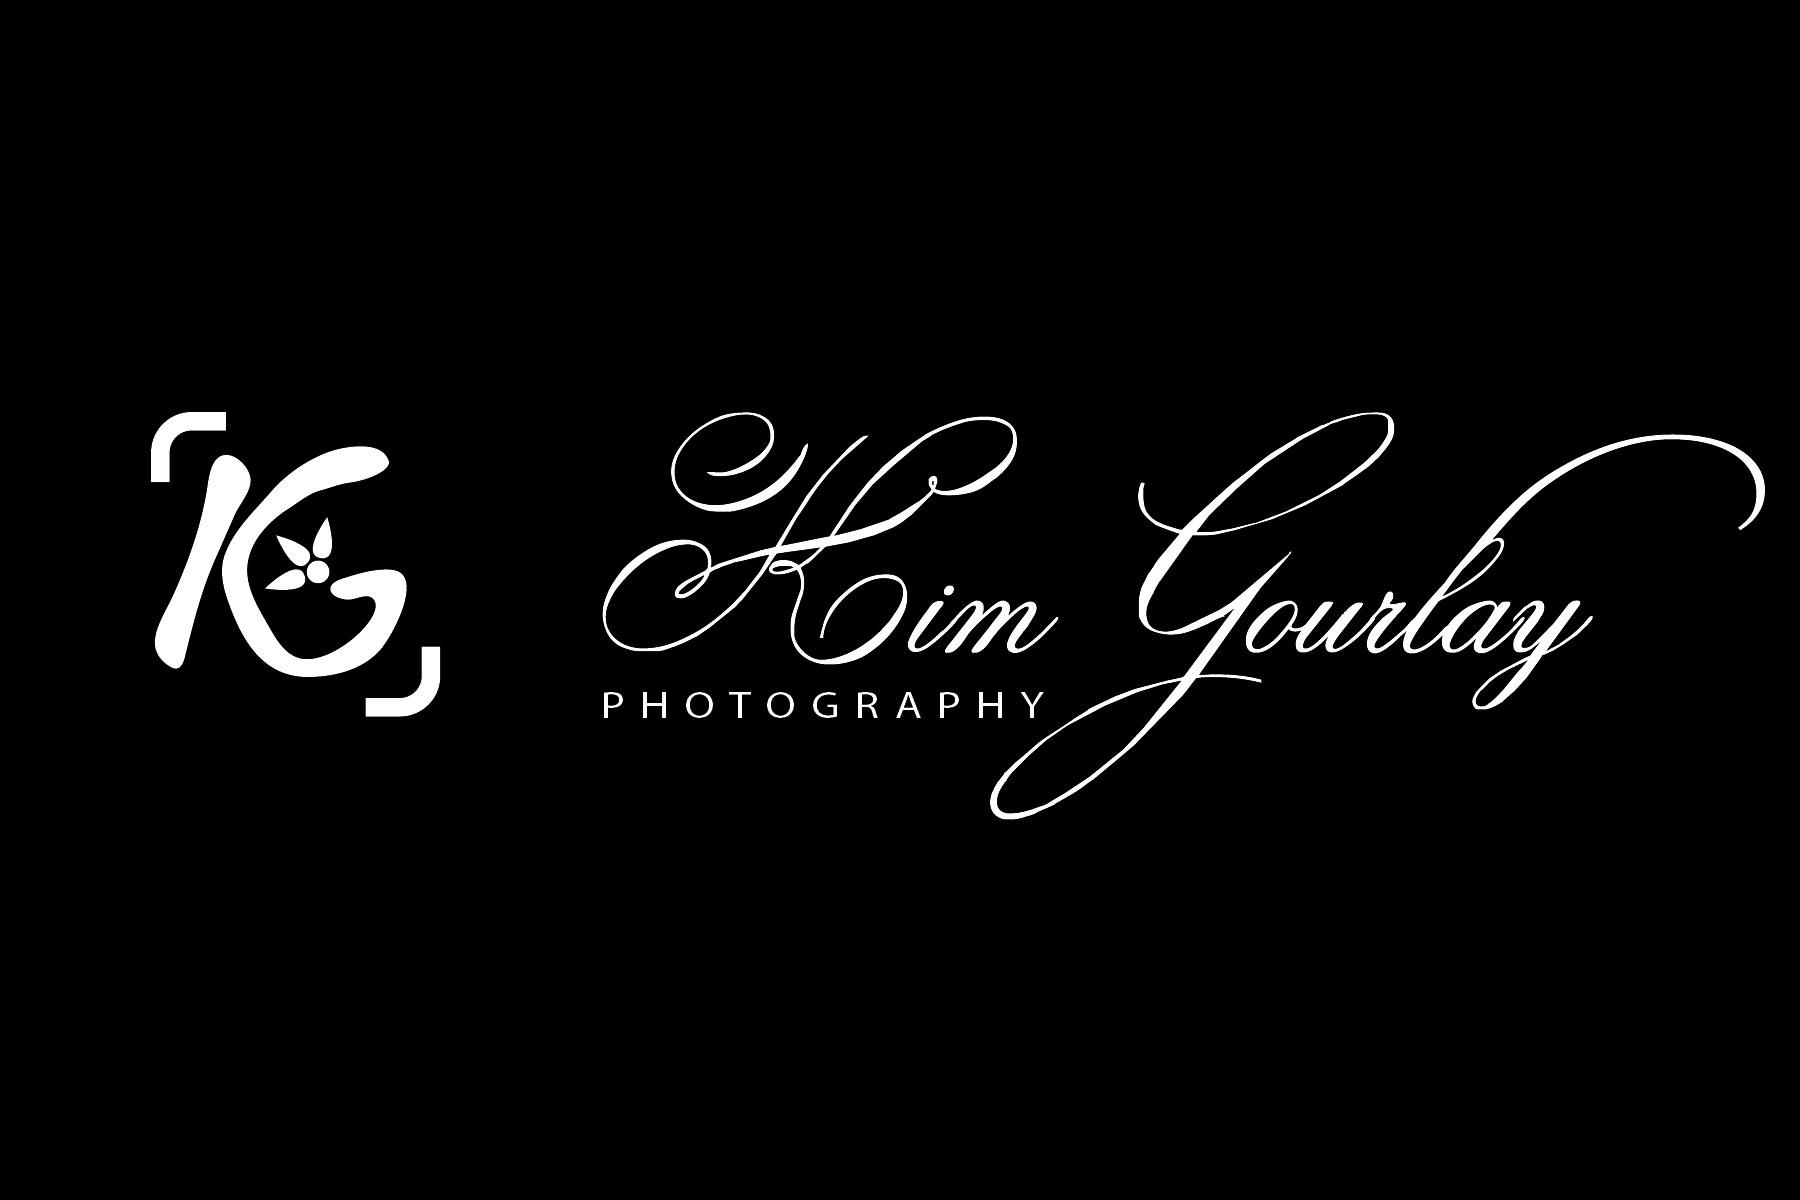 Kim Gourlay Signature